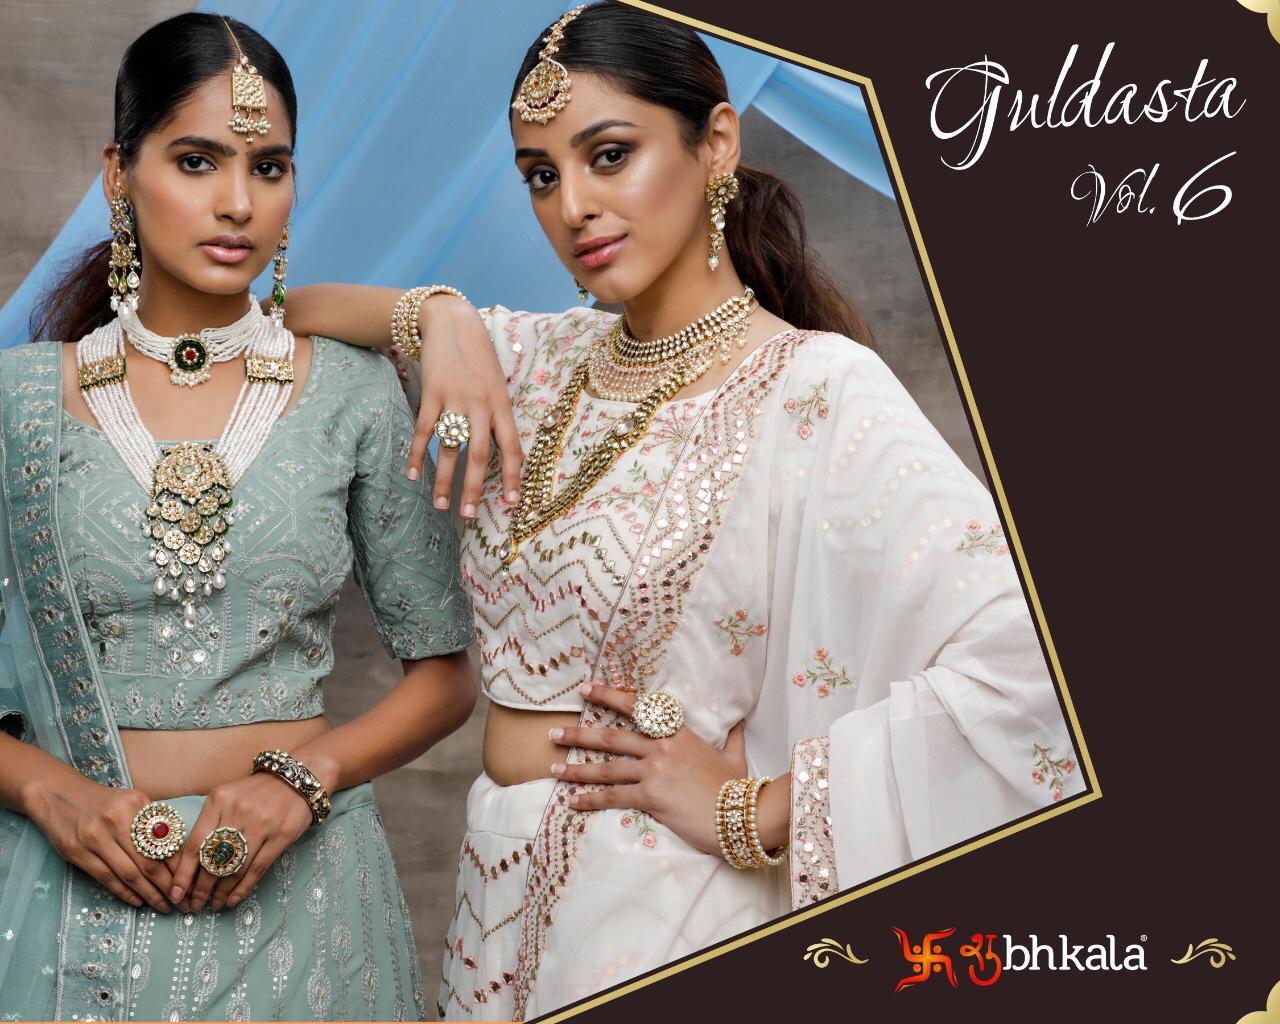 Shubhkala Guldasta Vol 6 Georgette Net Exclusive Designer Bridal Lehenga Collections